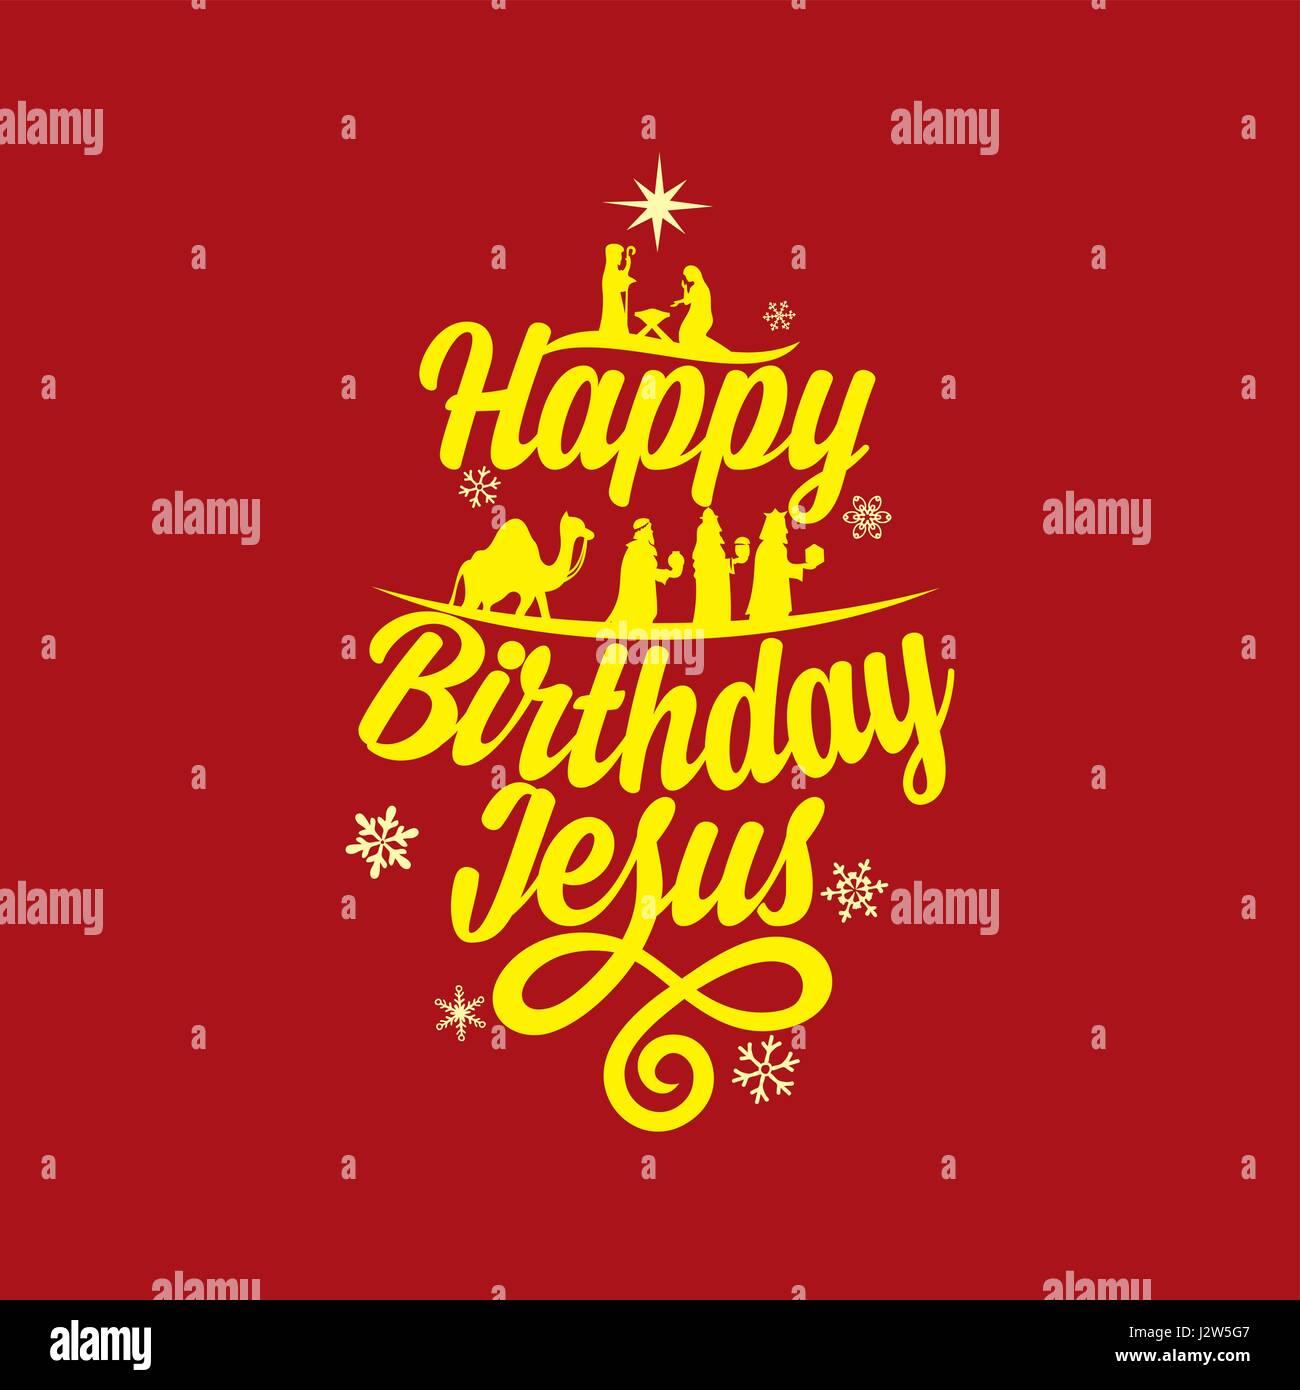 Postcard Of A Merry Christmas Happy Birthday Jesus Stock Vector Image Art Alamy